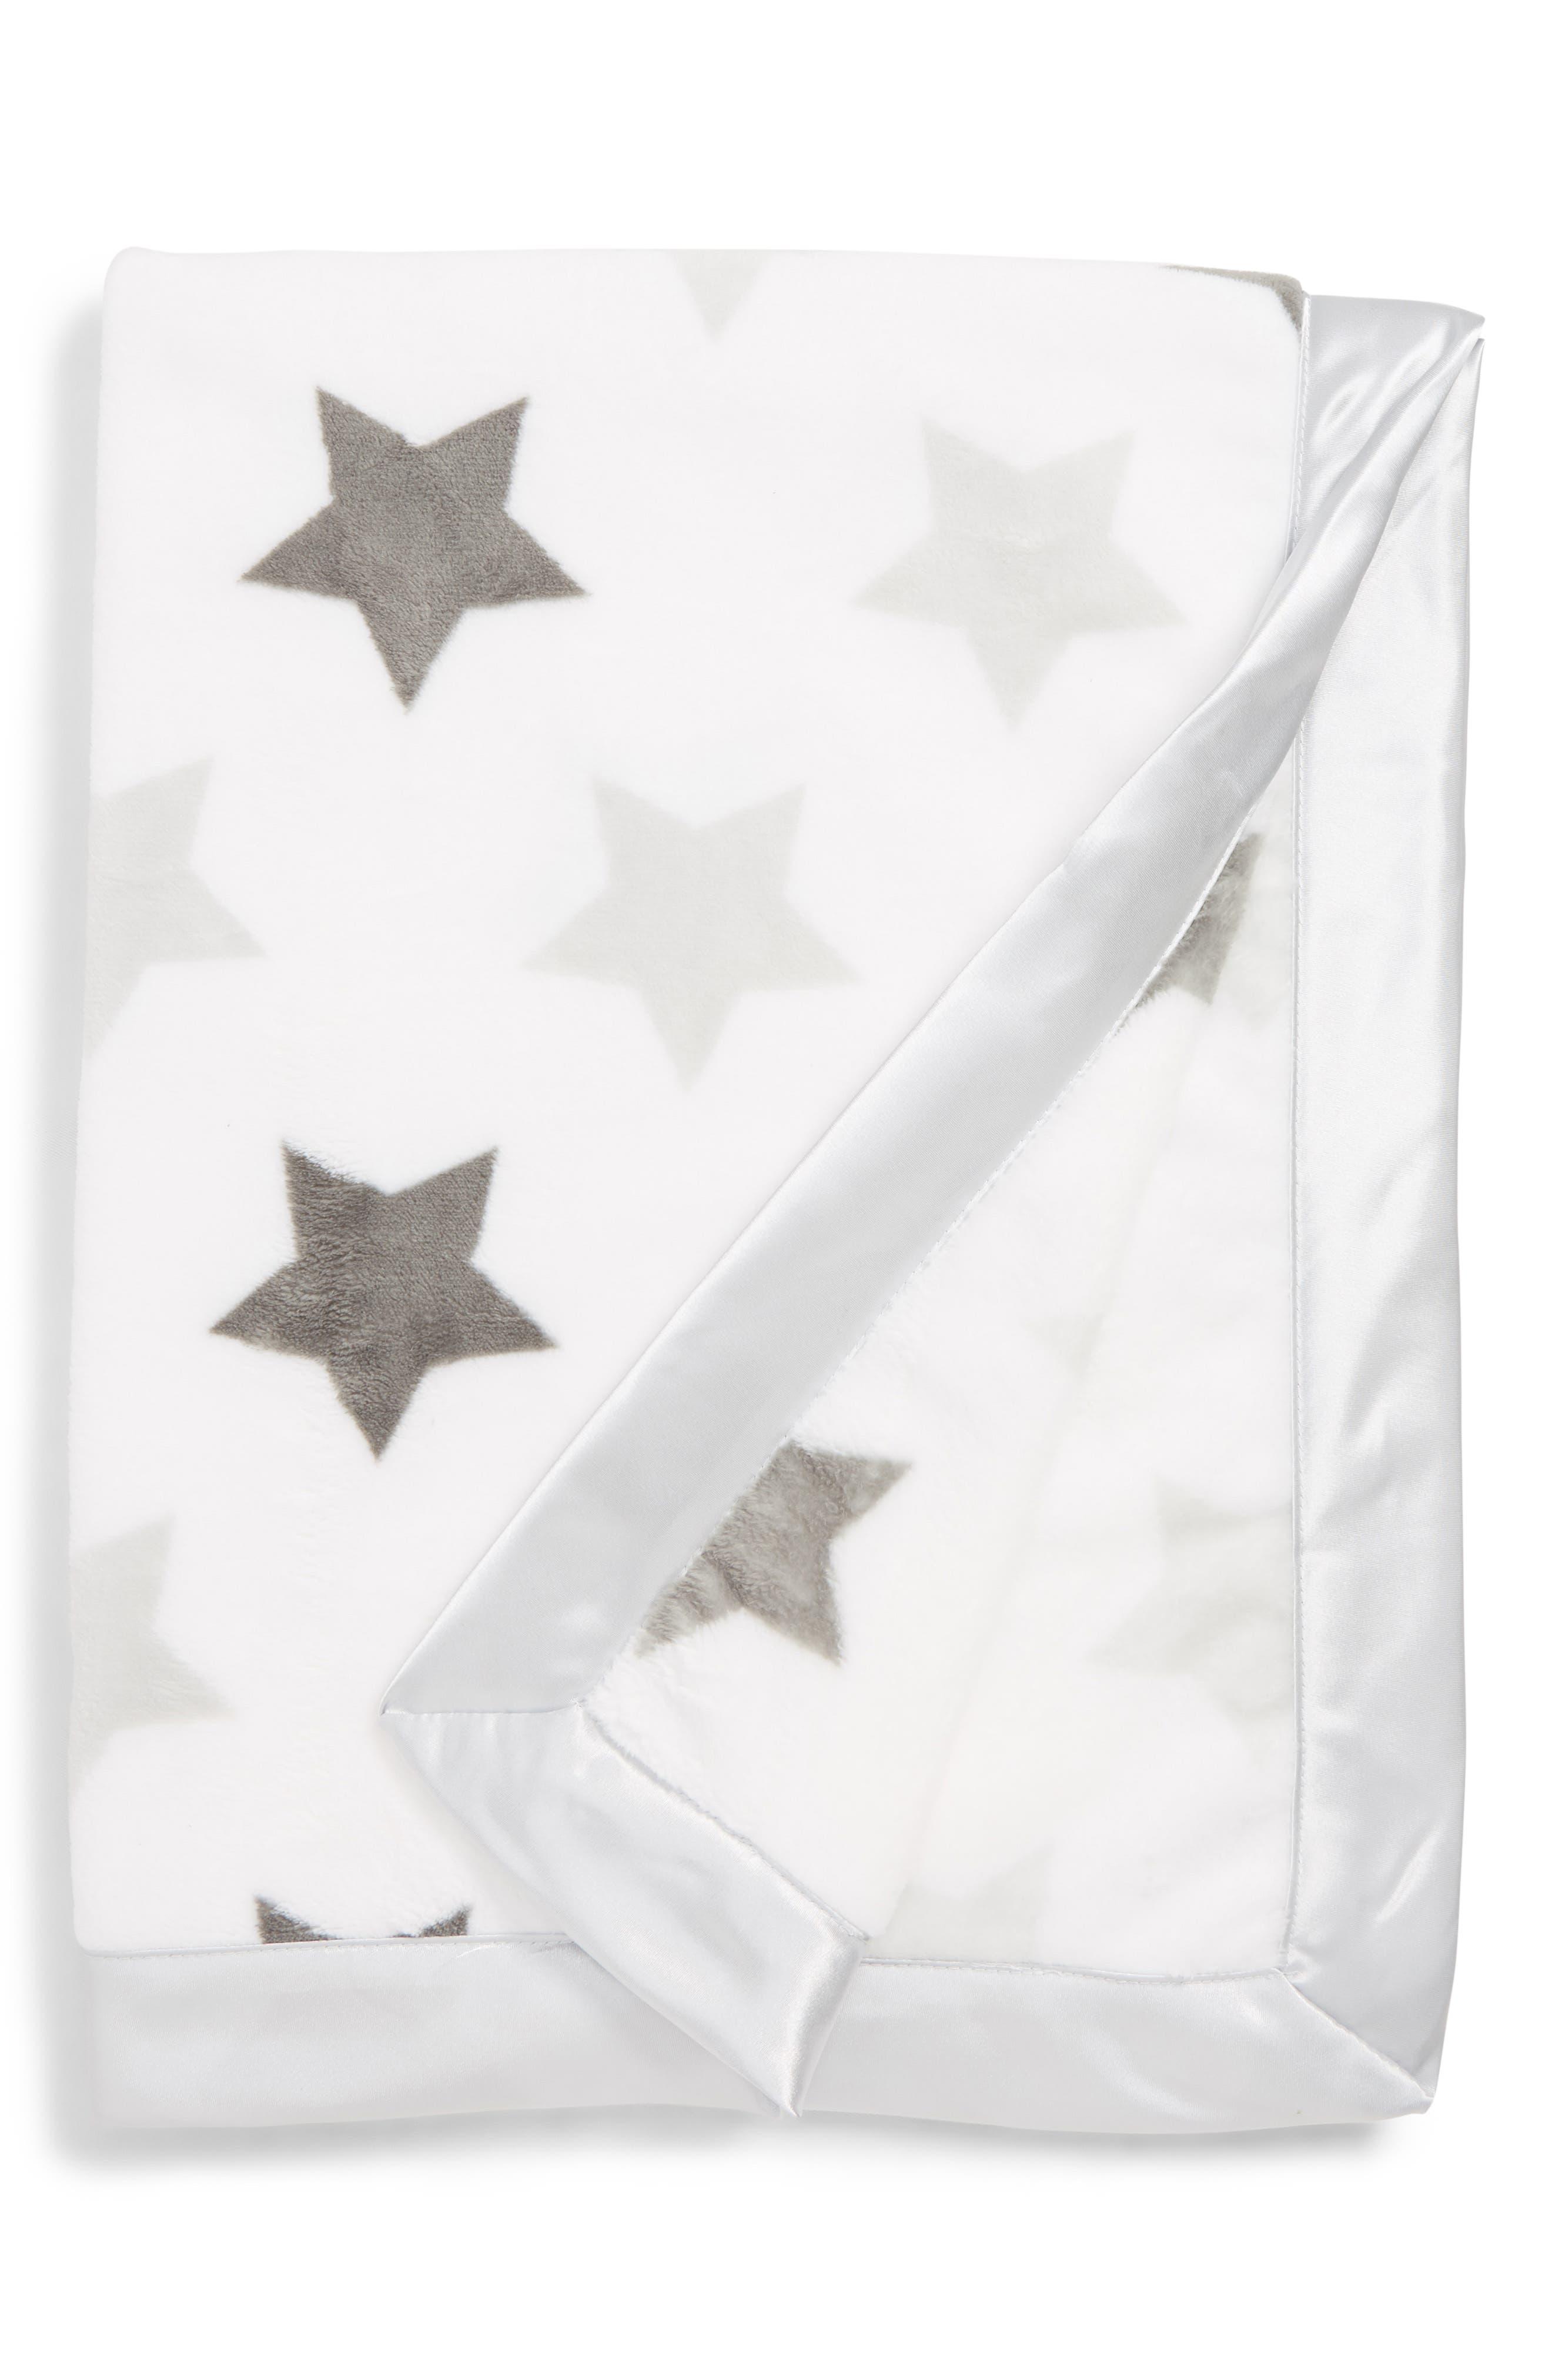 NORDSTROM BABY, Print Plush Blanket, Main thumbnail 1, color, GREY MICRO STARS